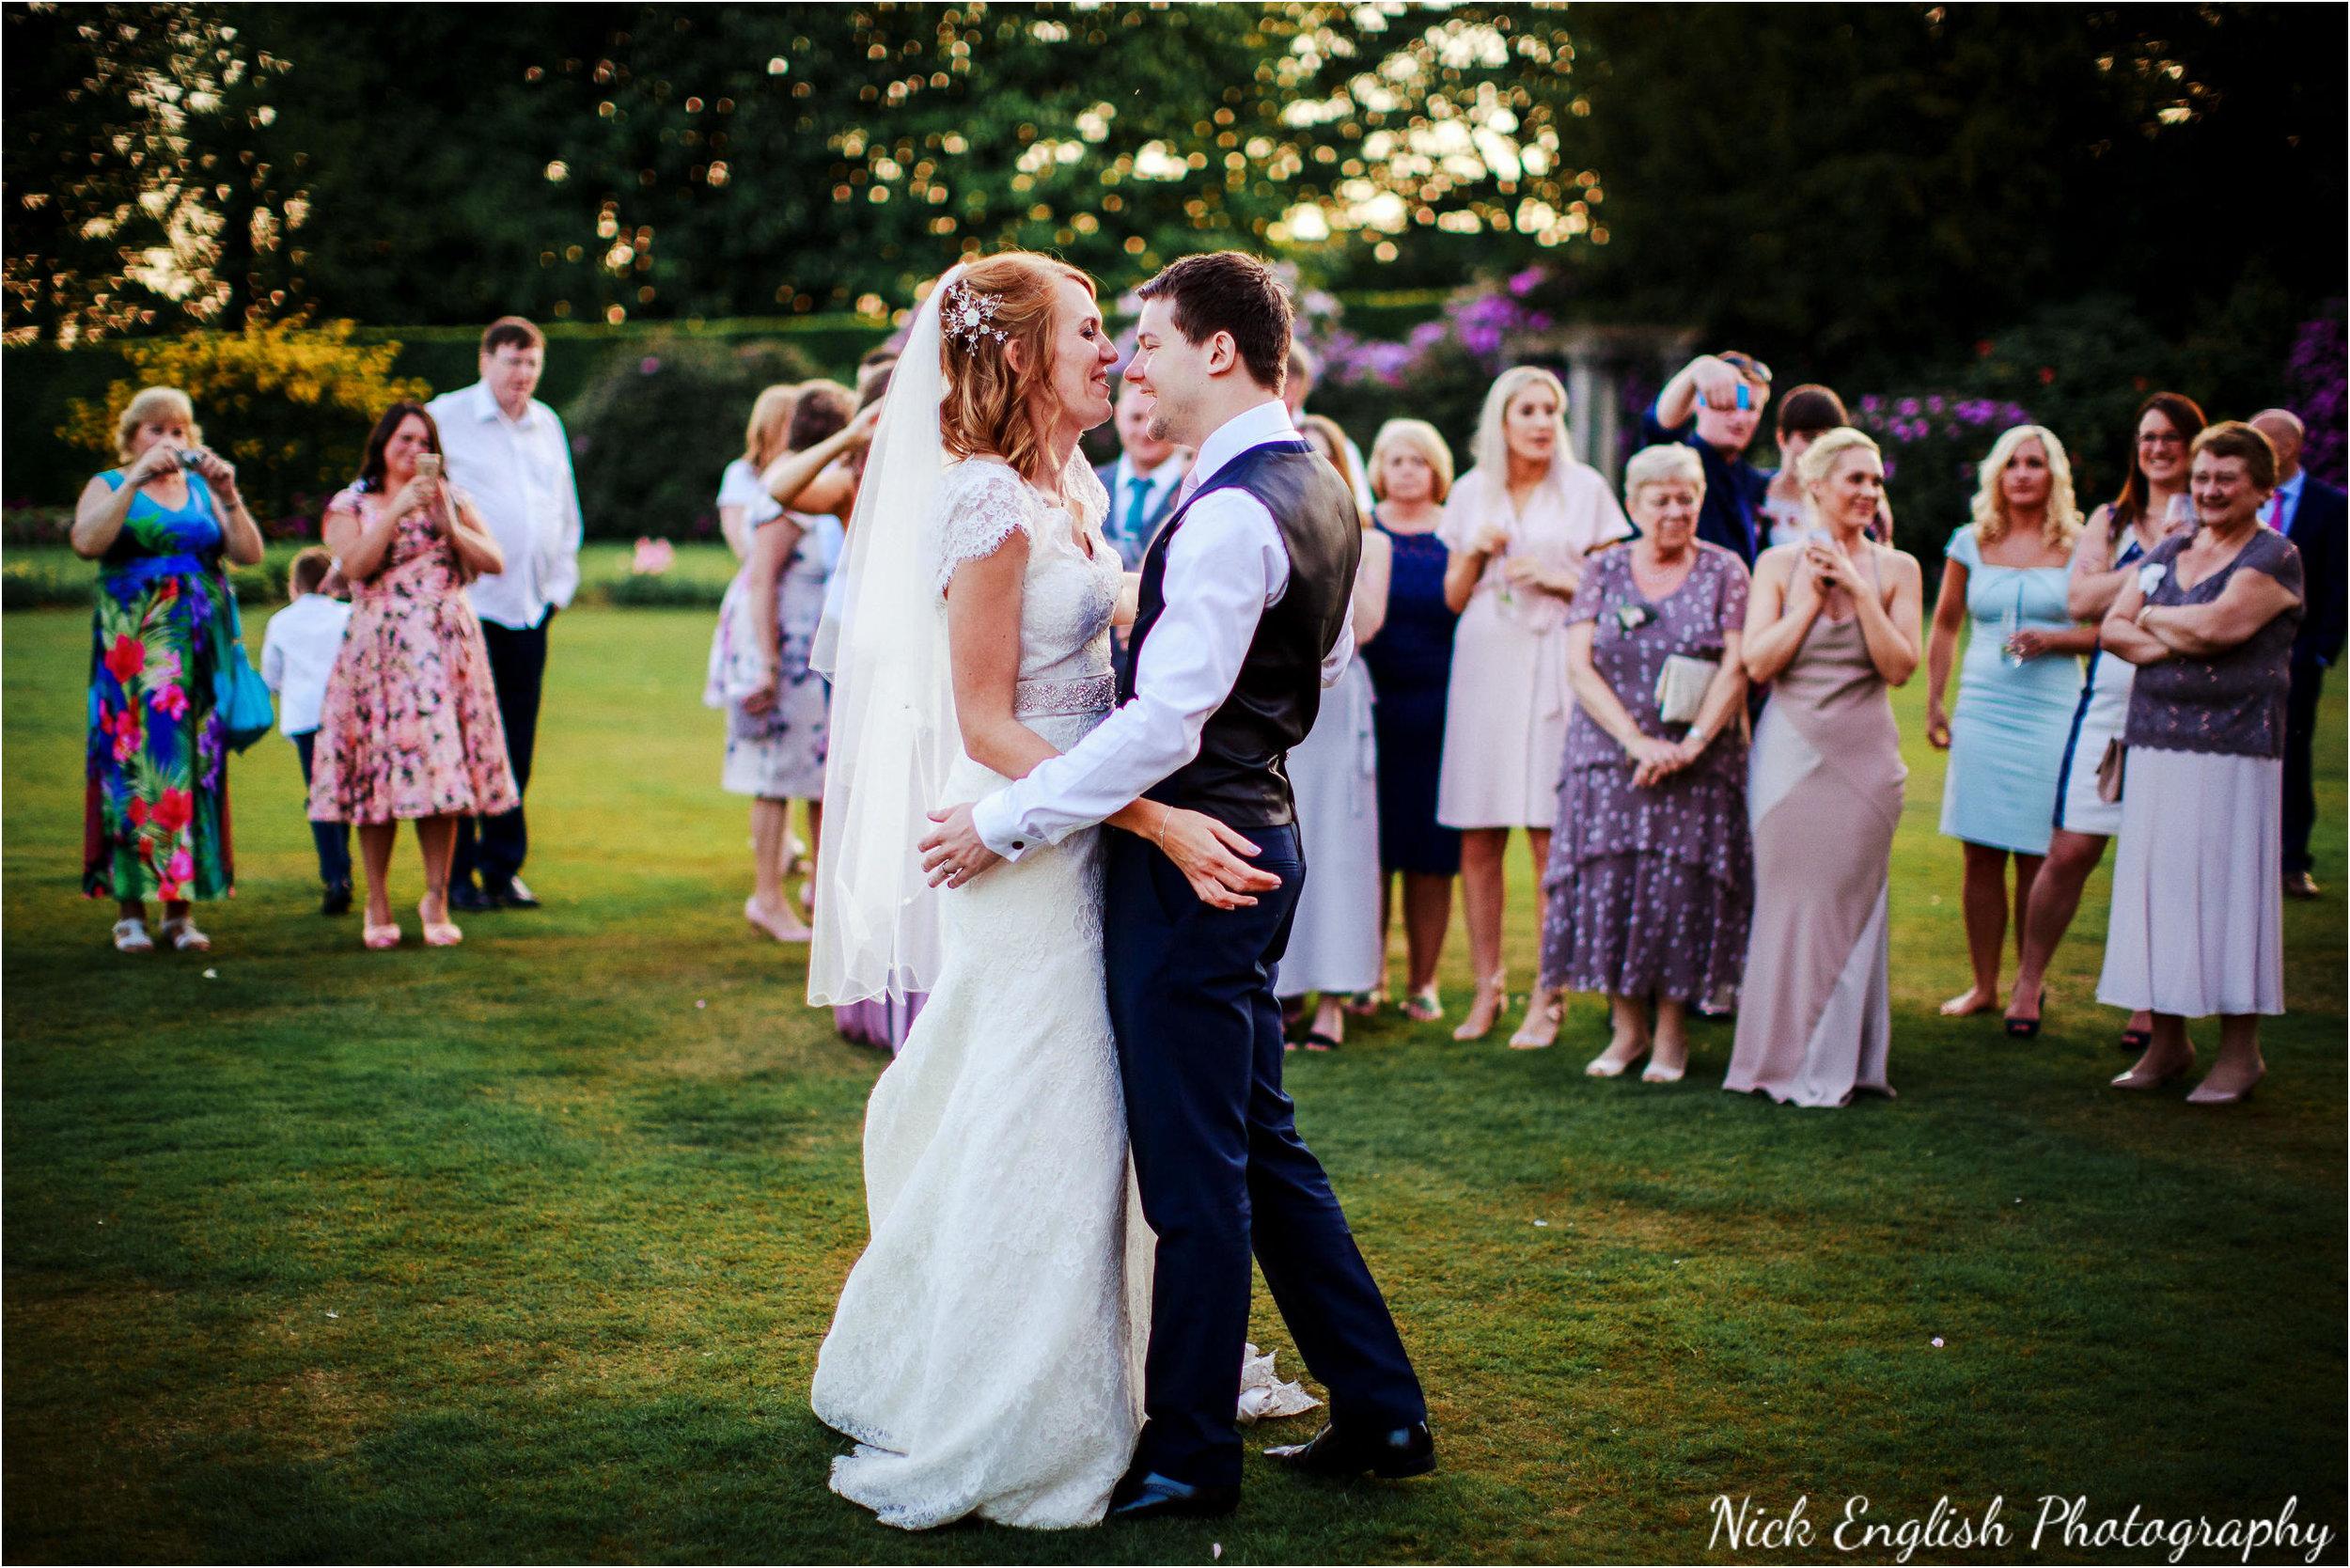 Alison James Wedding Photographs at Eaves Hall West Bradford 239jpg.jpeg